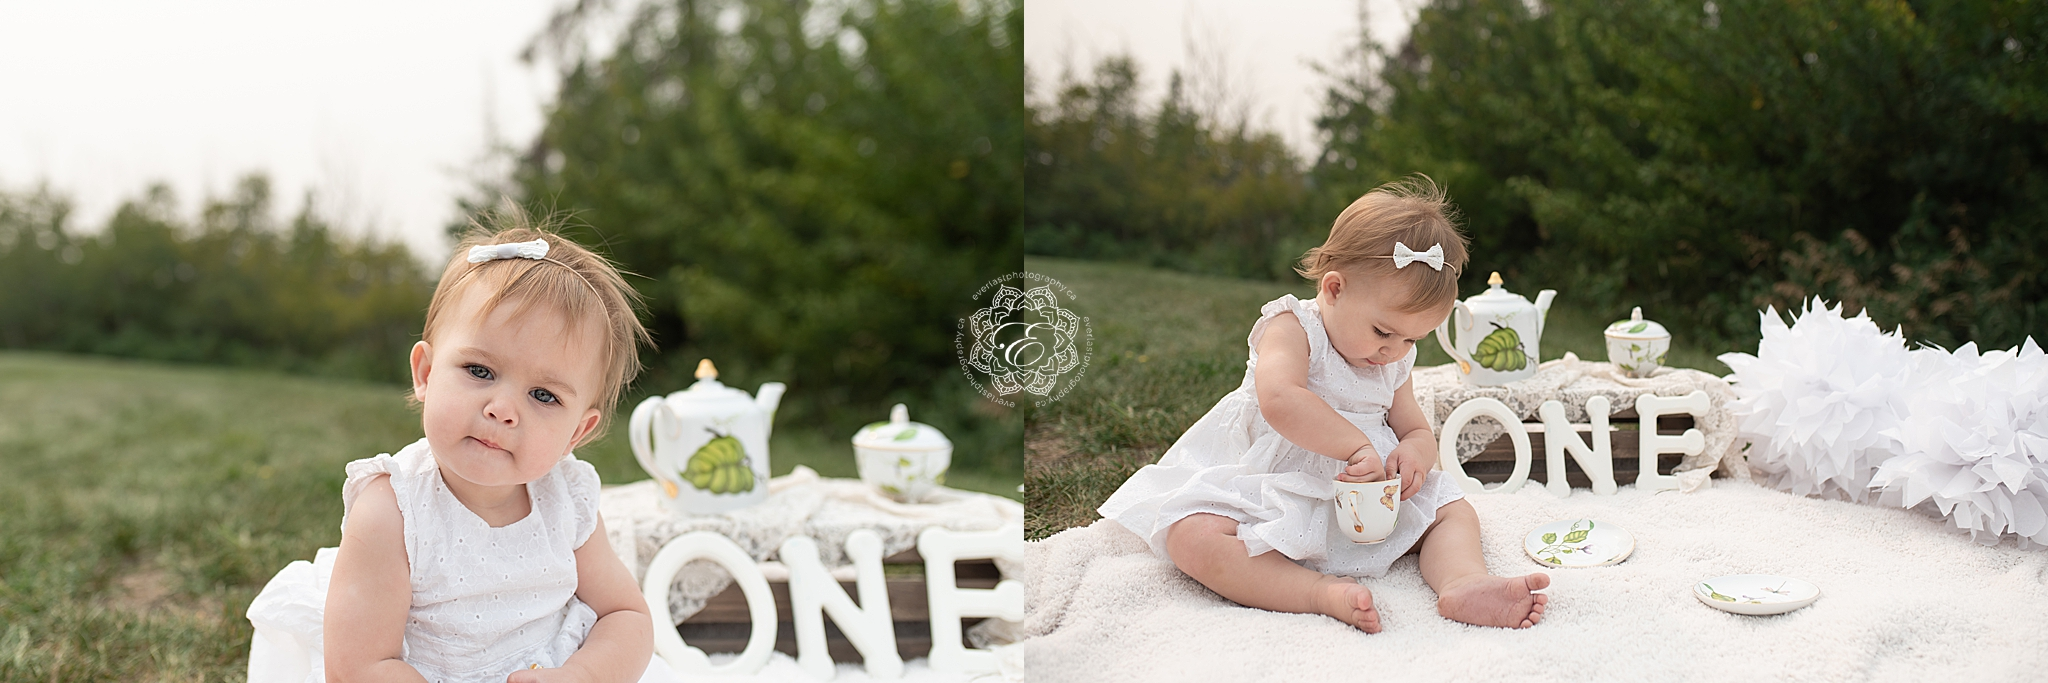 baby-one-year-photos.jpg